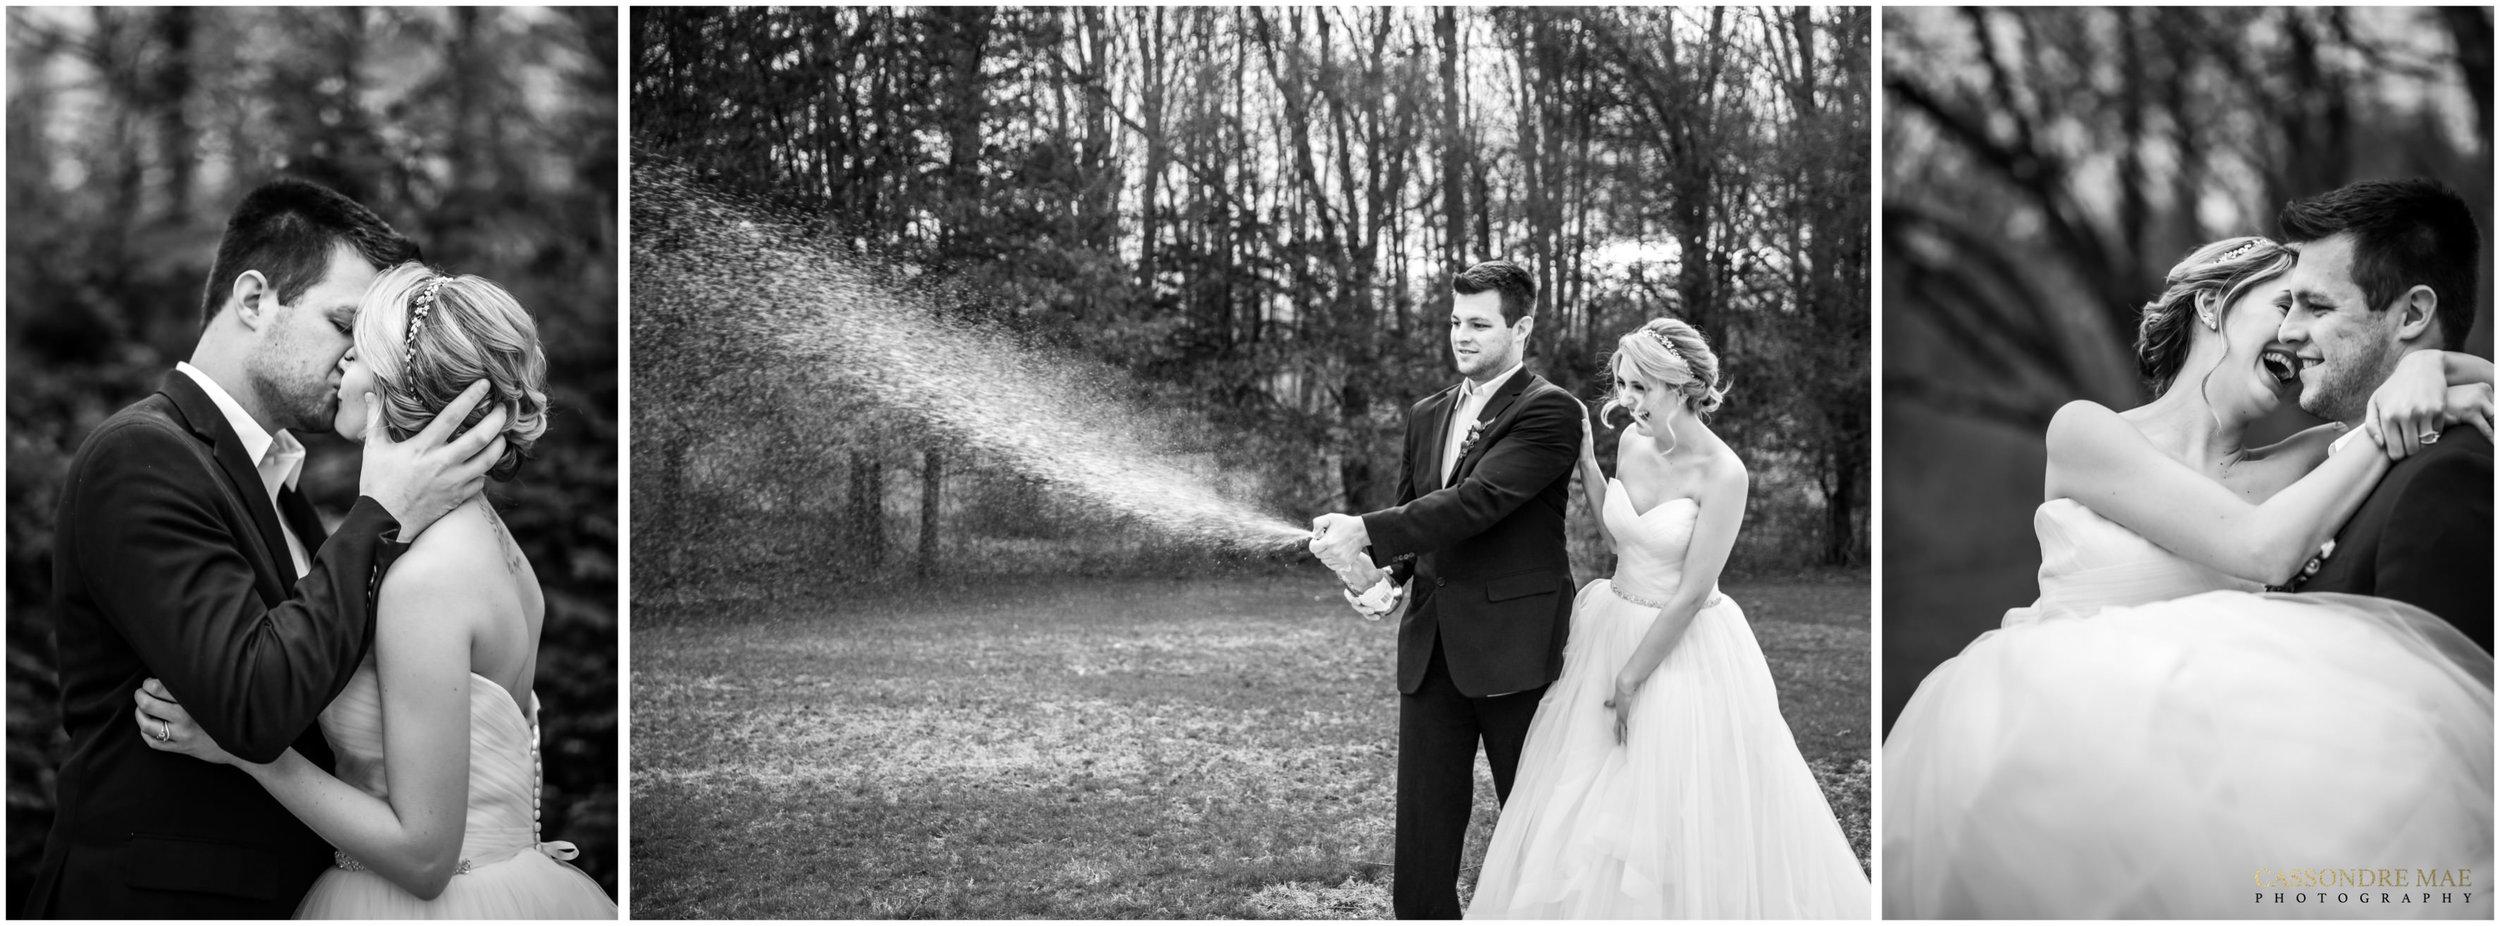 Cassondre Mae Photography Preston Barn Wedding 35.jpg